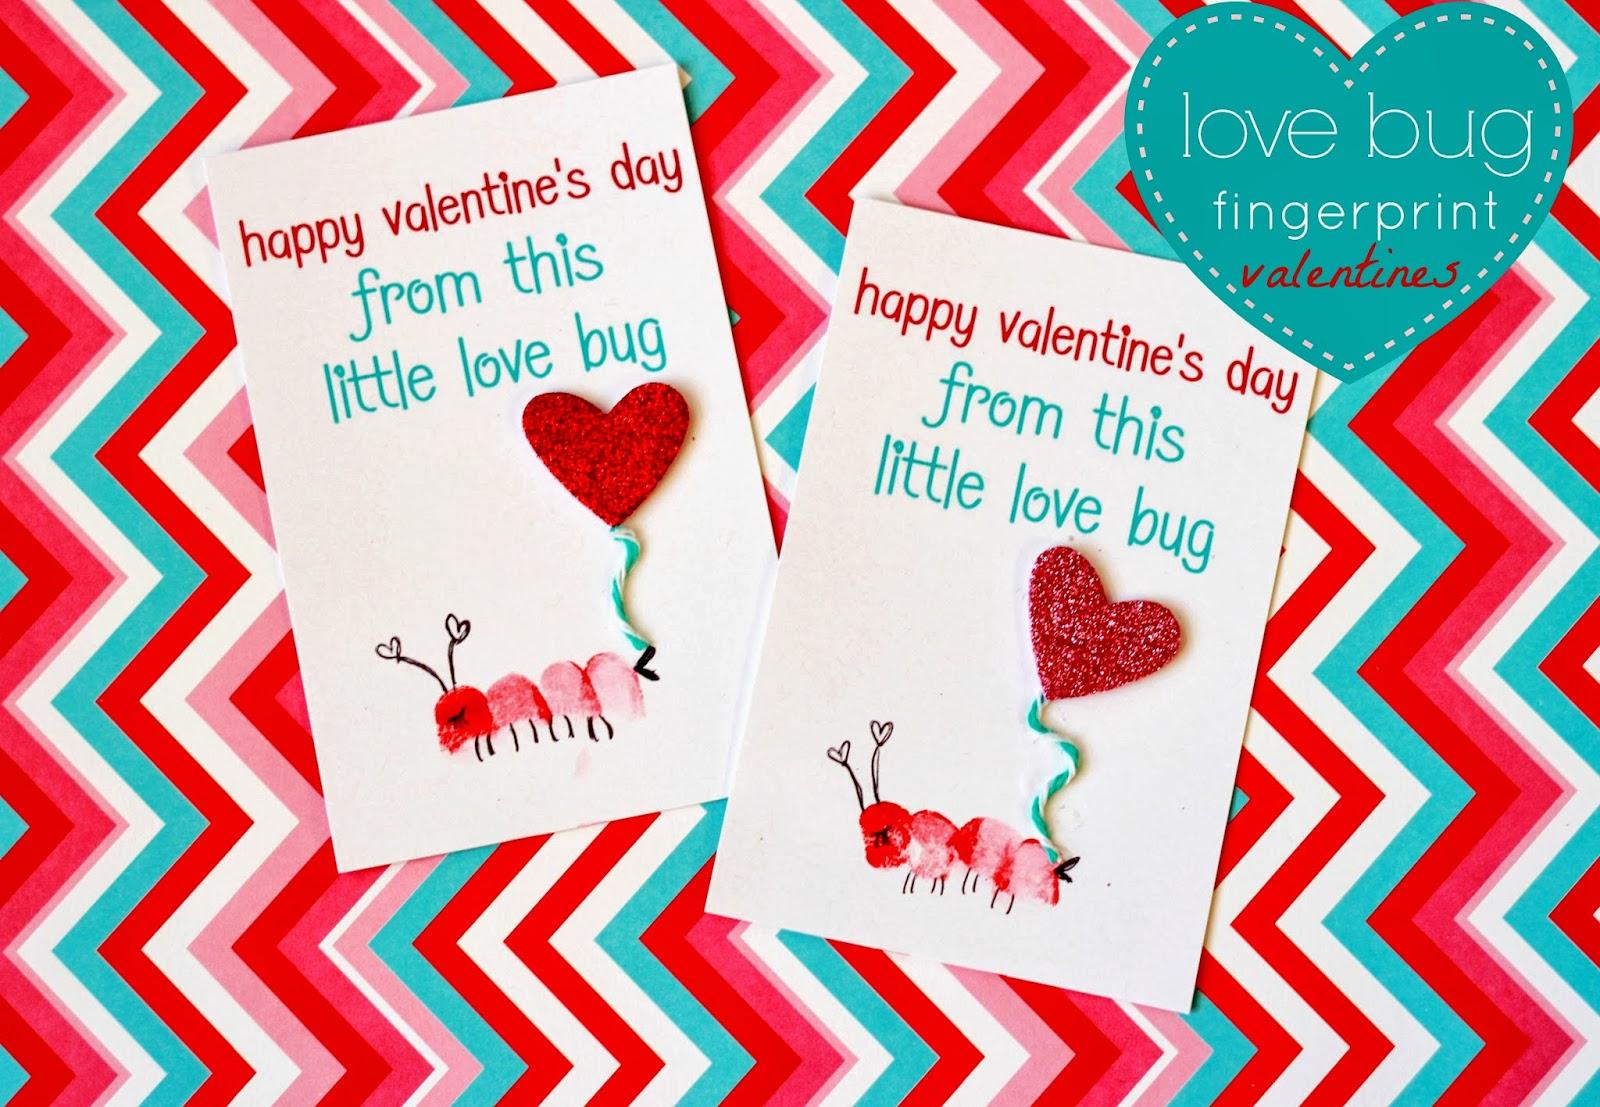 fingerprint_valentines